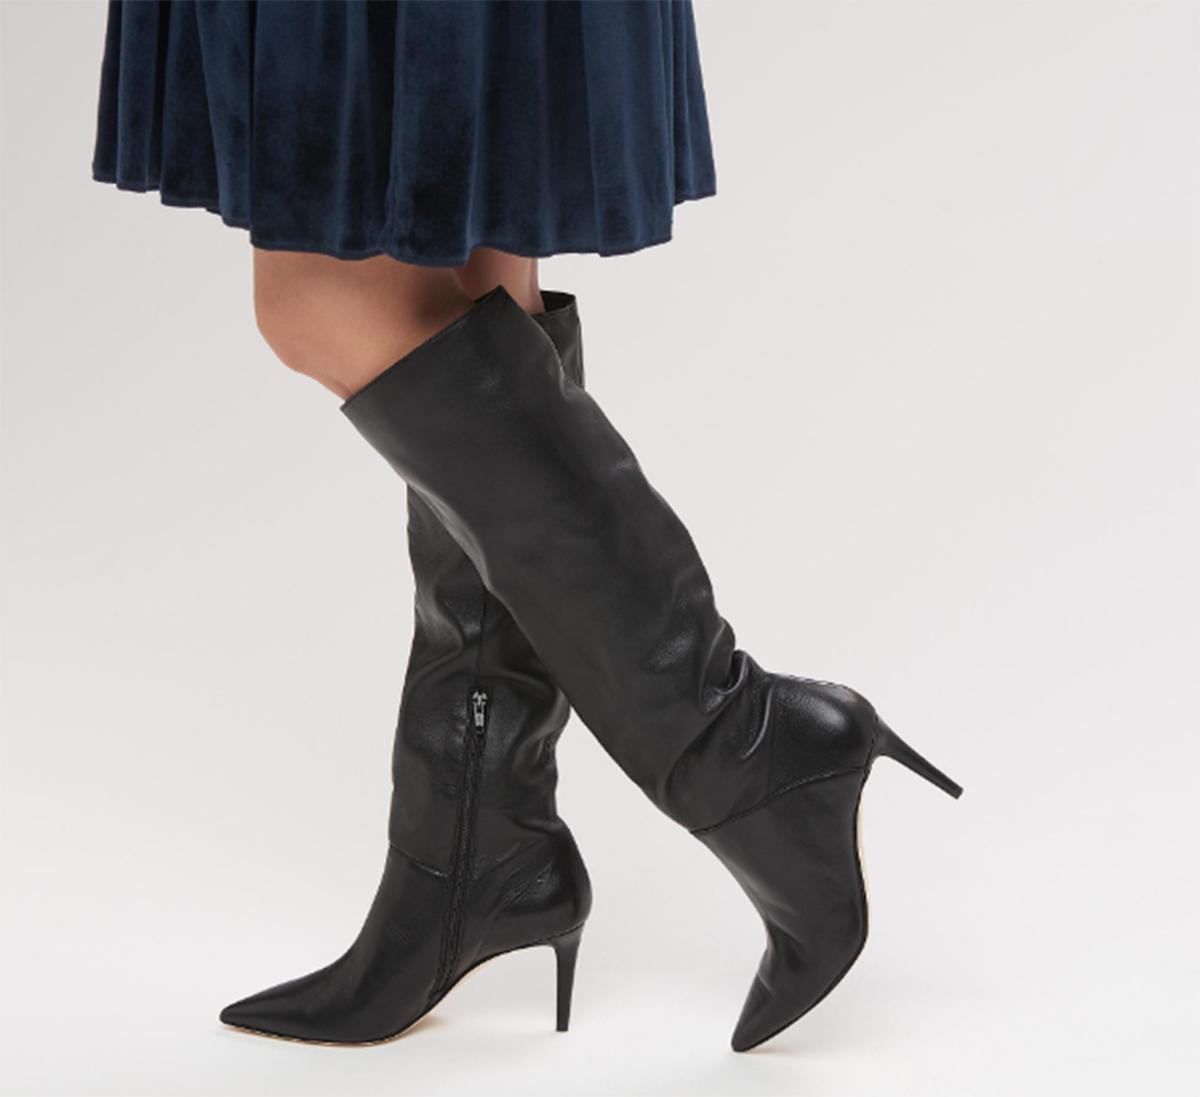 Zena Boots